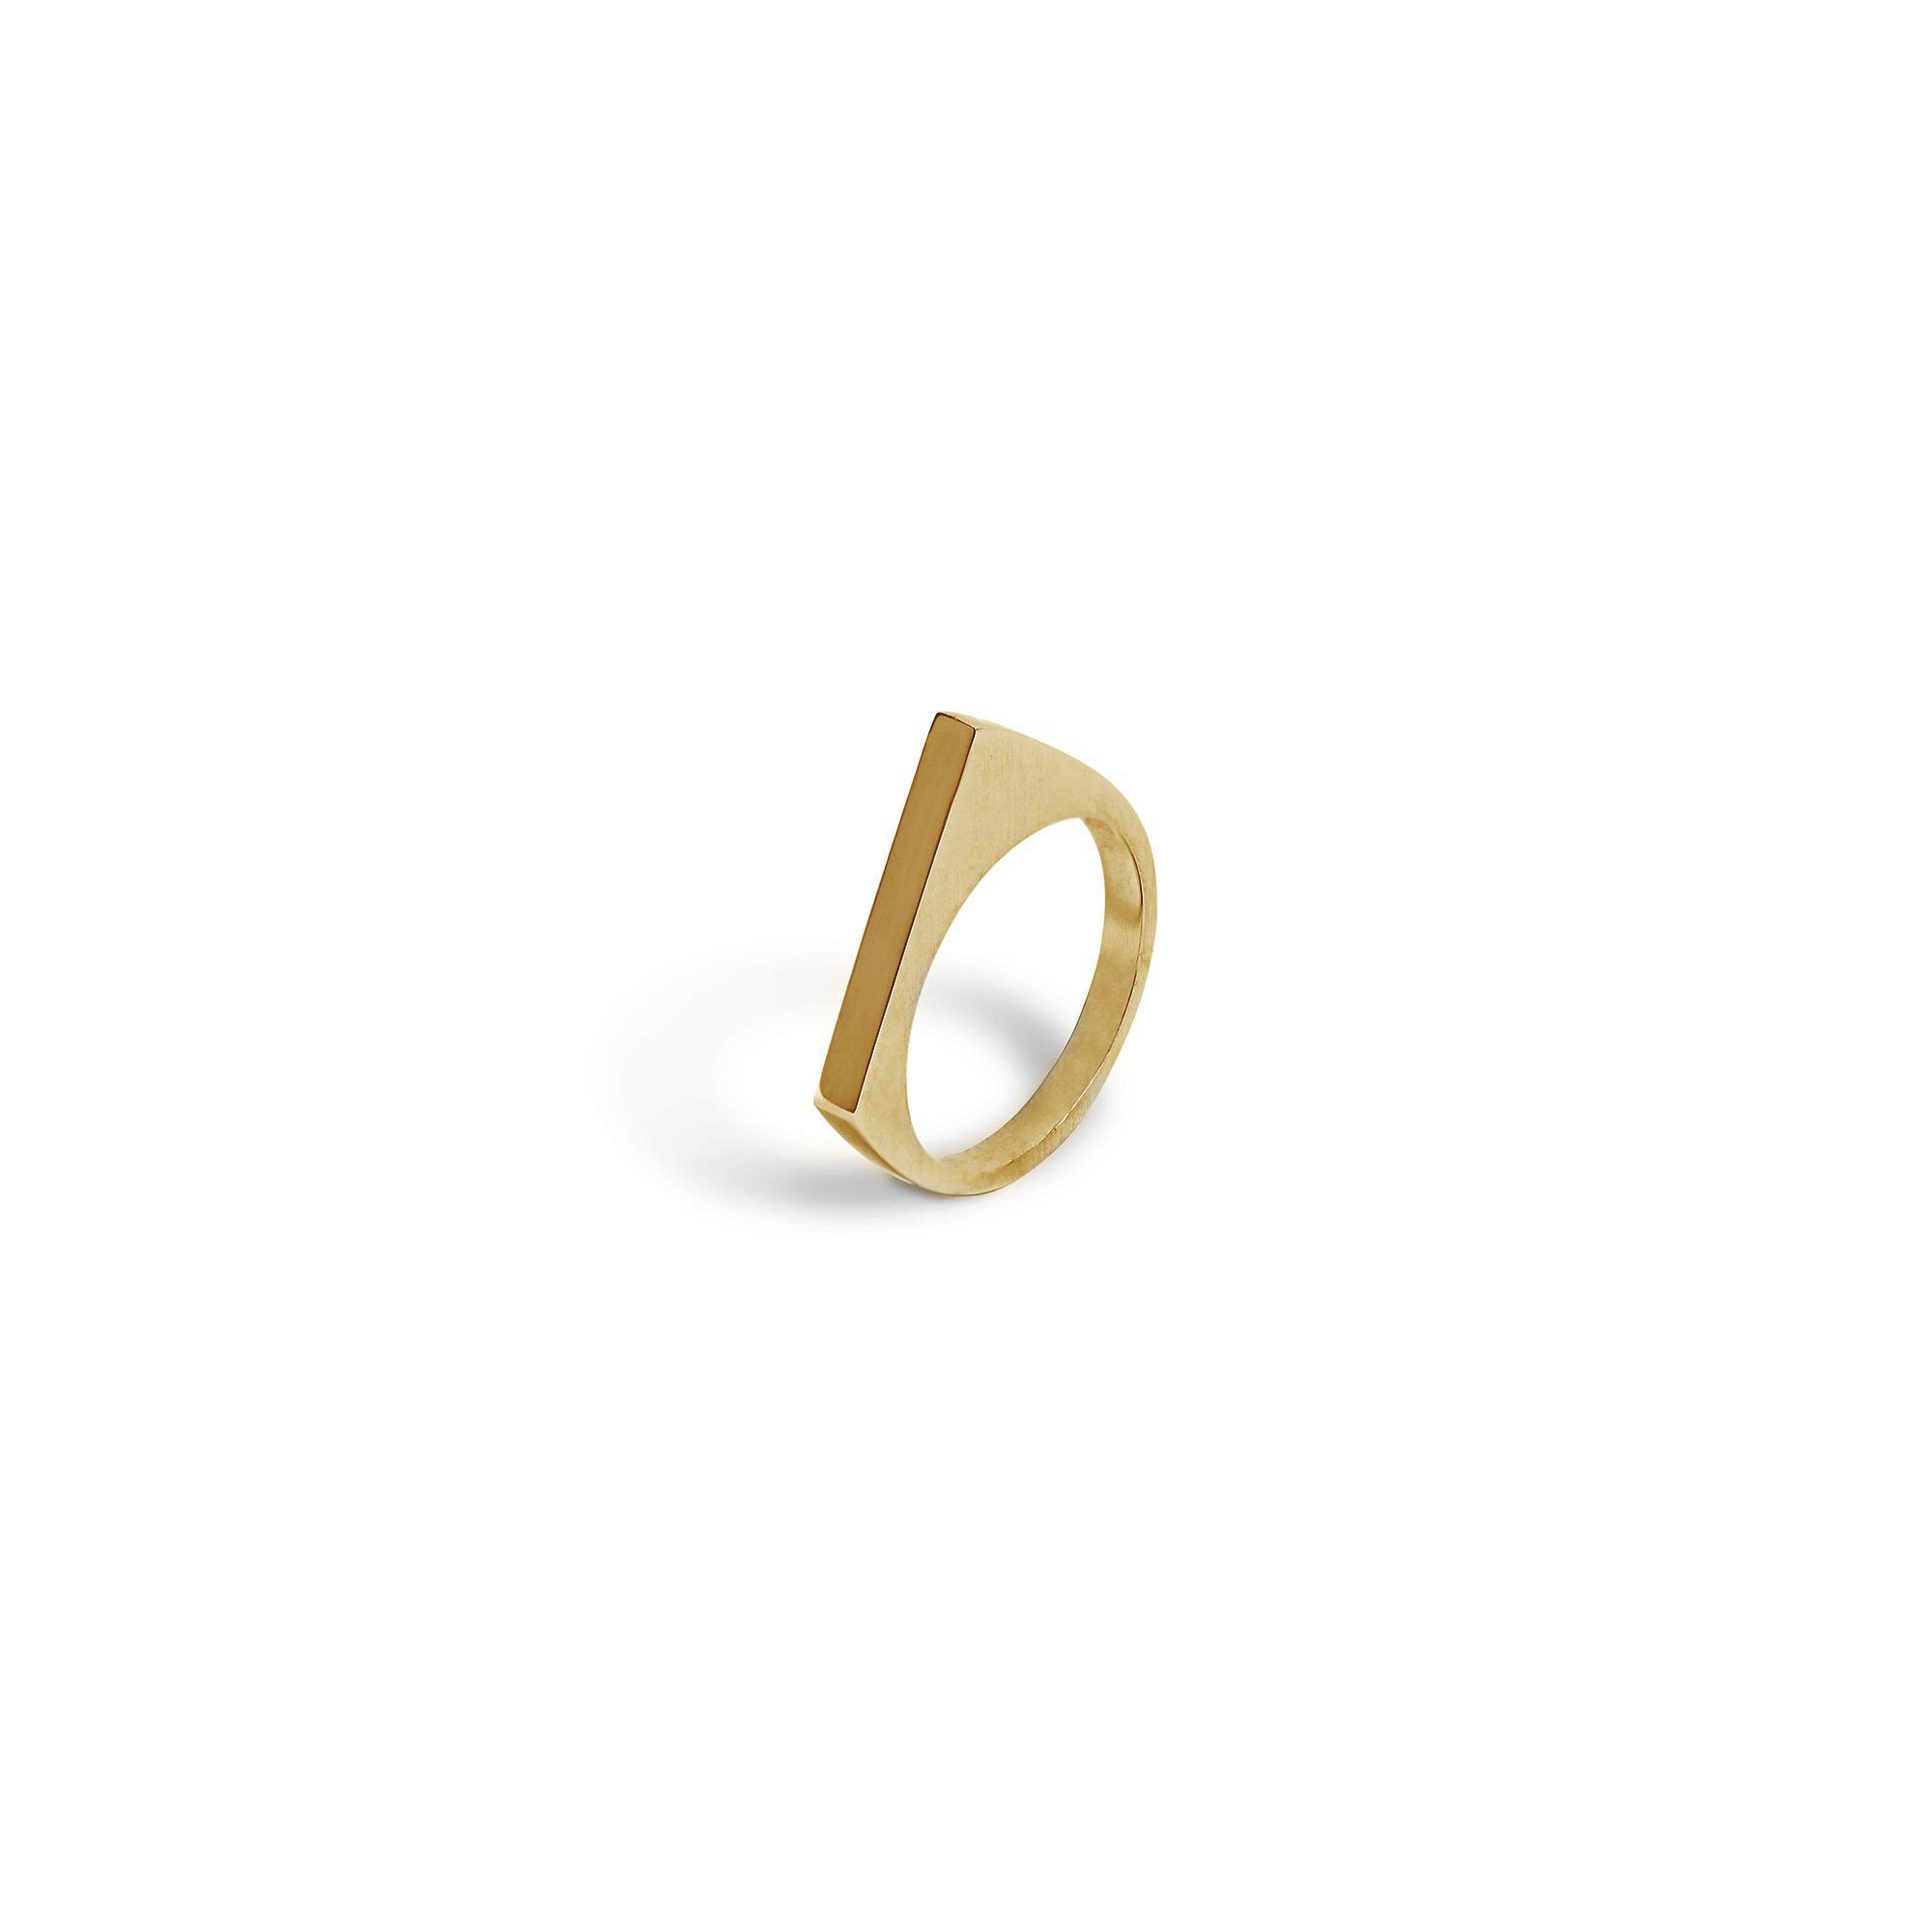 Modular 'Congiunzioni' point ring Bronze ring